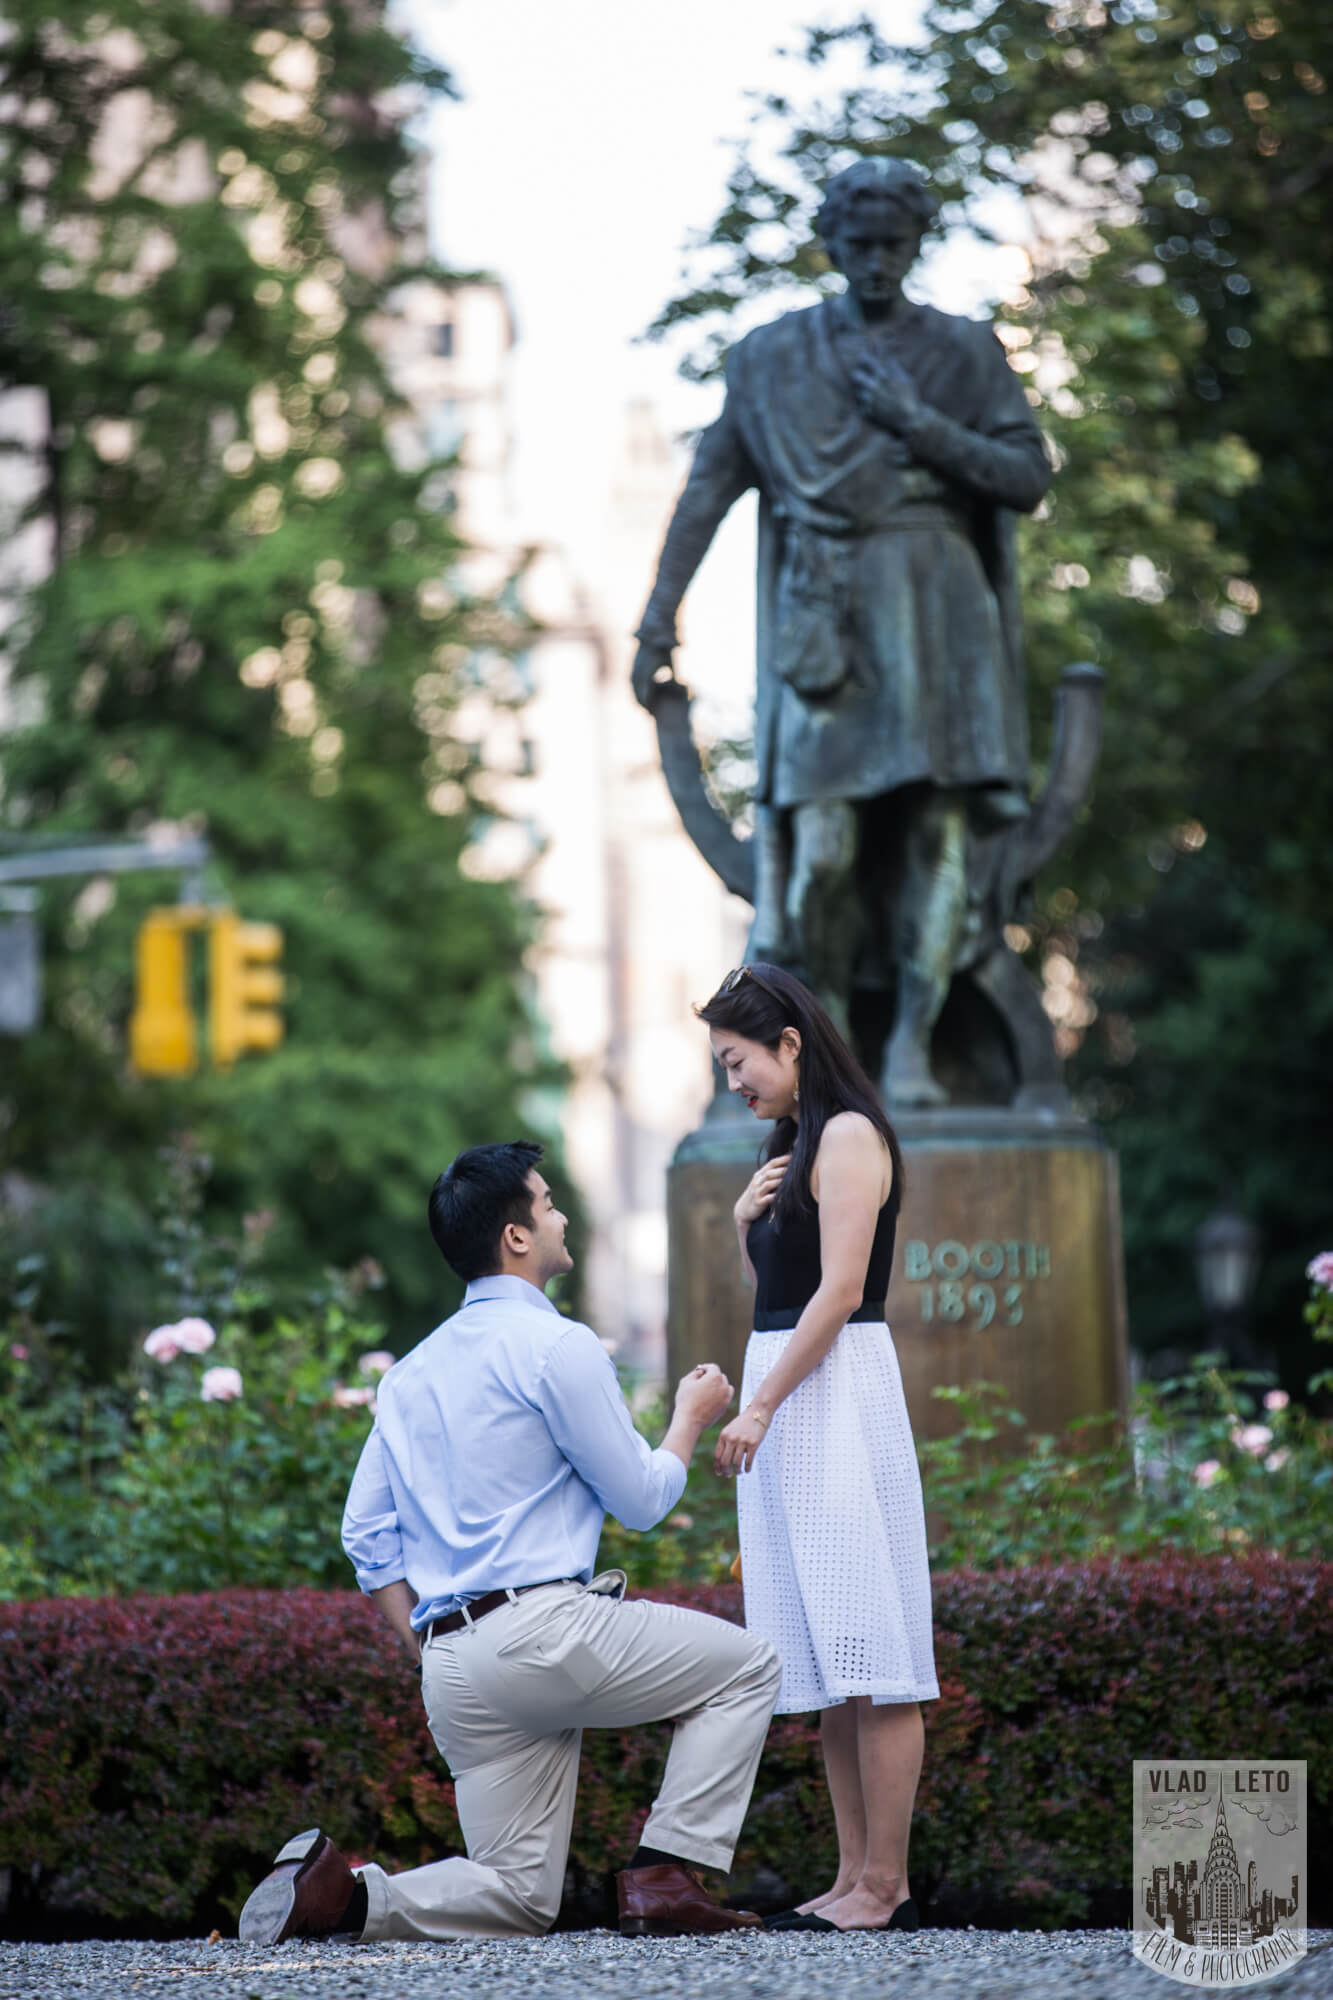 Photo Gramercy Park Marriage Proposal   VladLeto